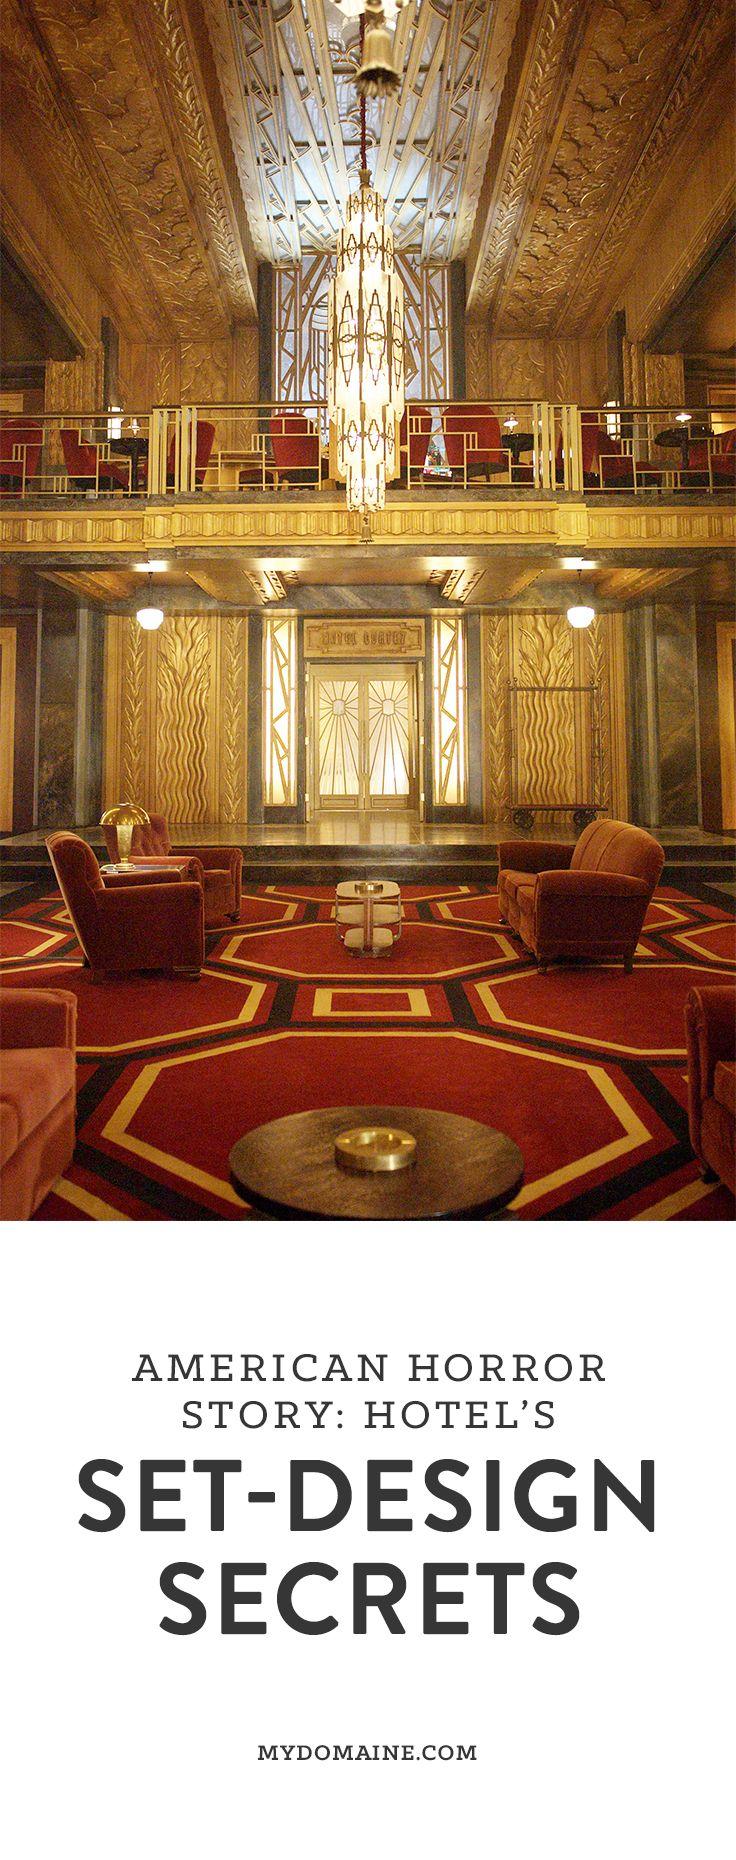 Design Secrets From American Horror Story Hotels Set Designer Hotel Lobby DesignArt Deco